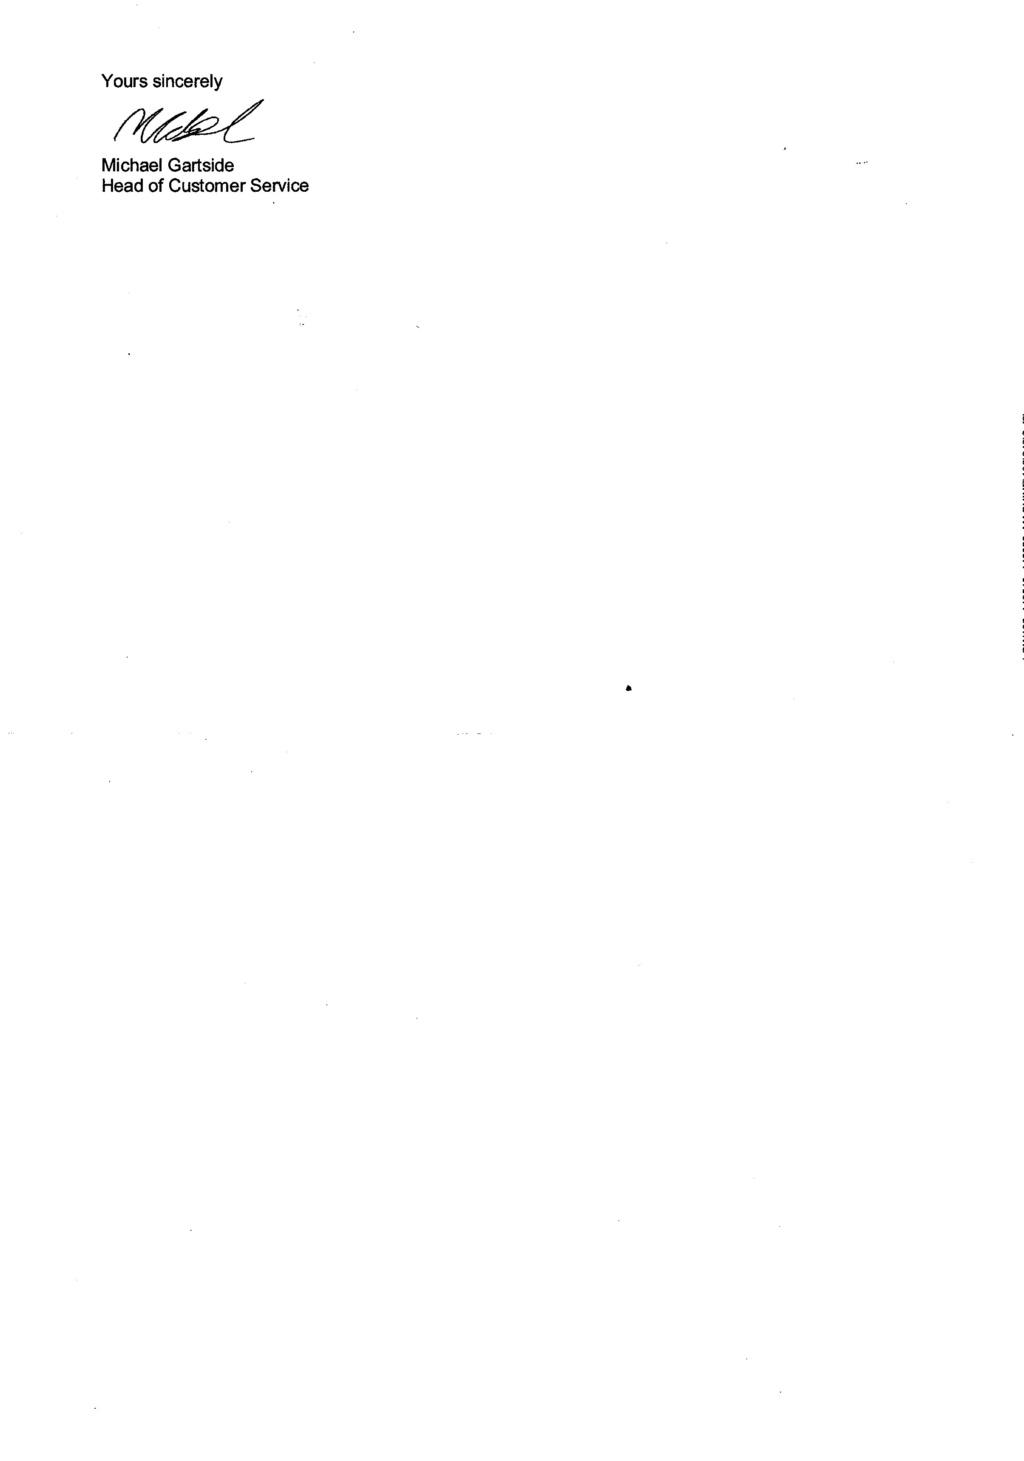 TESCO CREDIT CARD & LOWELLS 0212